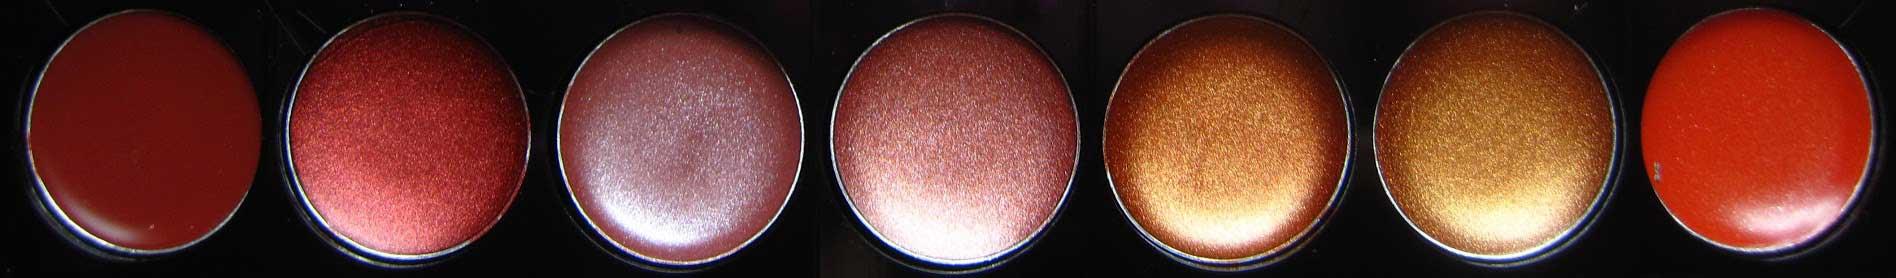 Make-up-Treasurebox-90